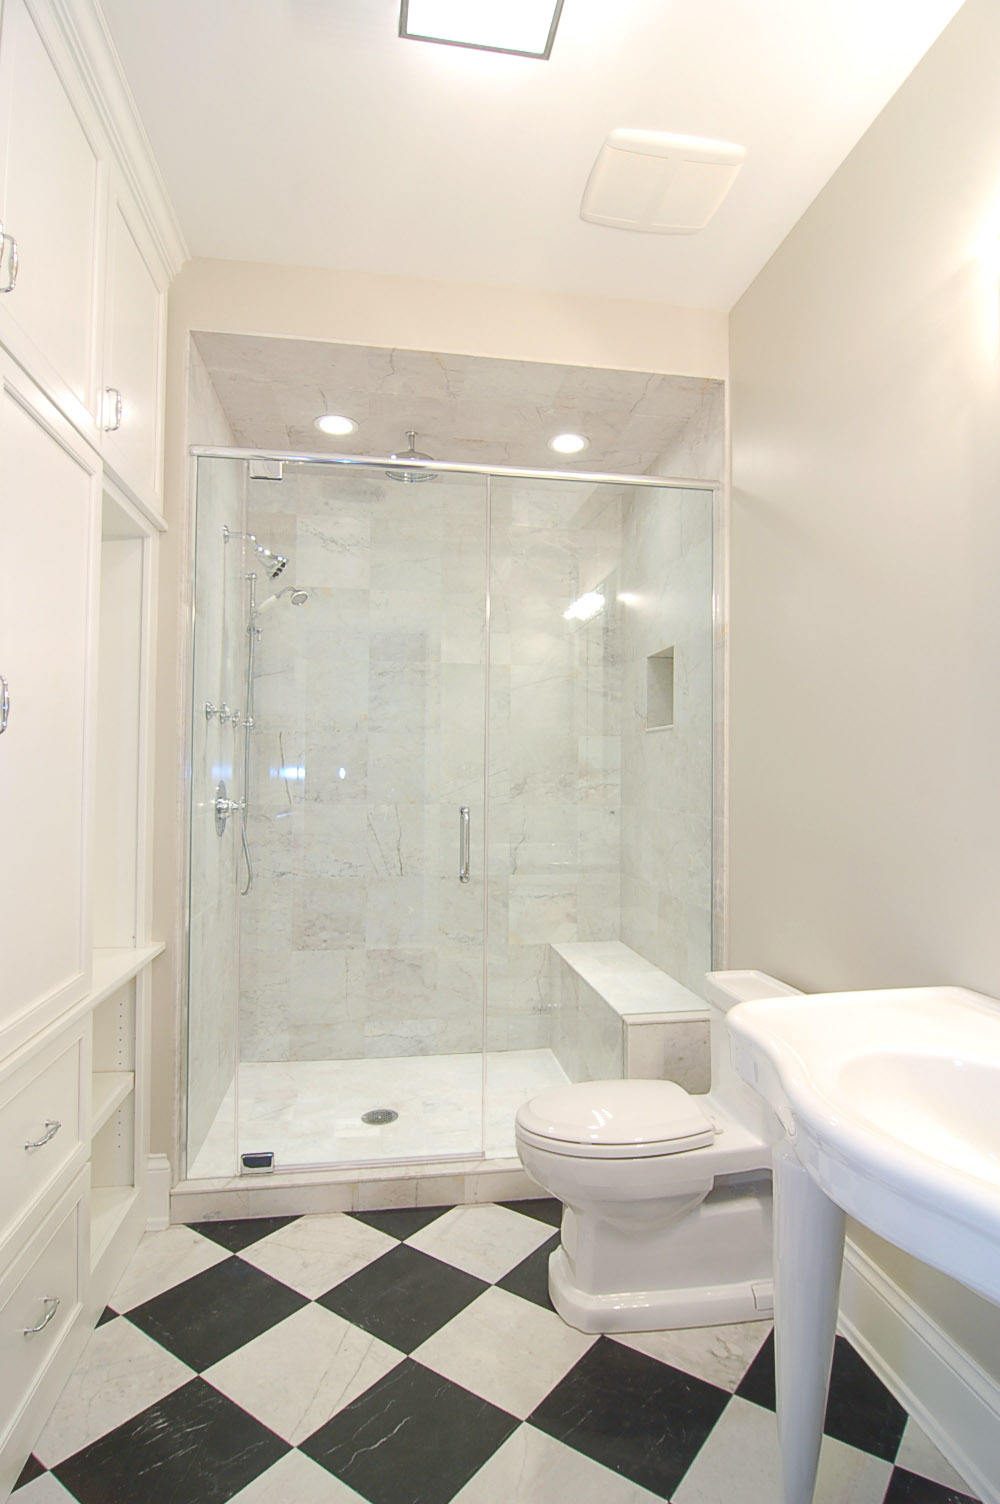 625_Schubert_Bathroom.jpg